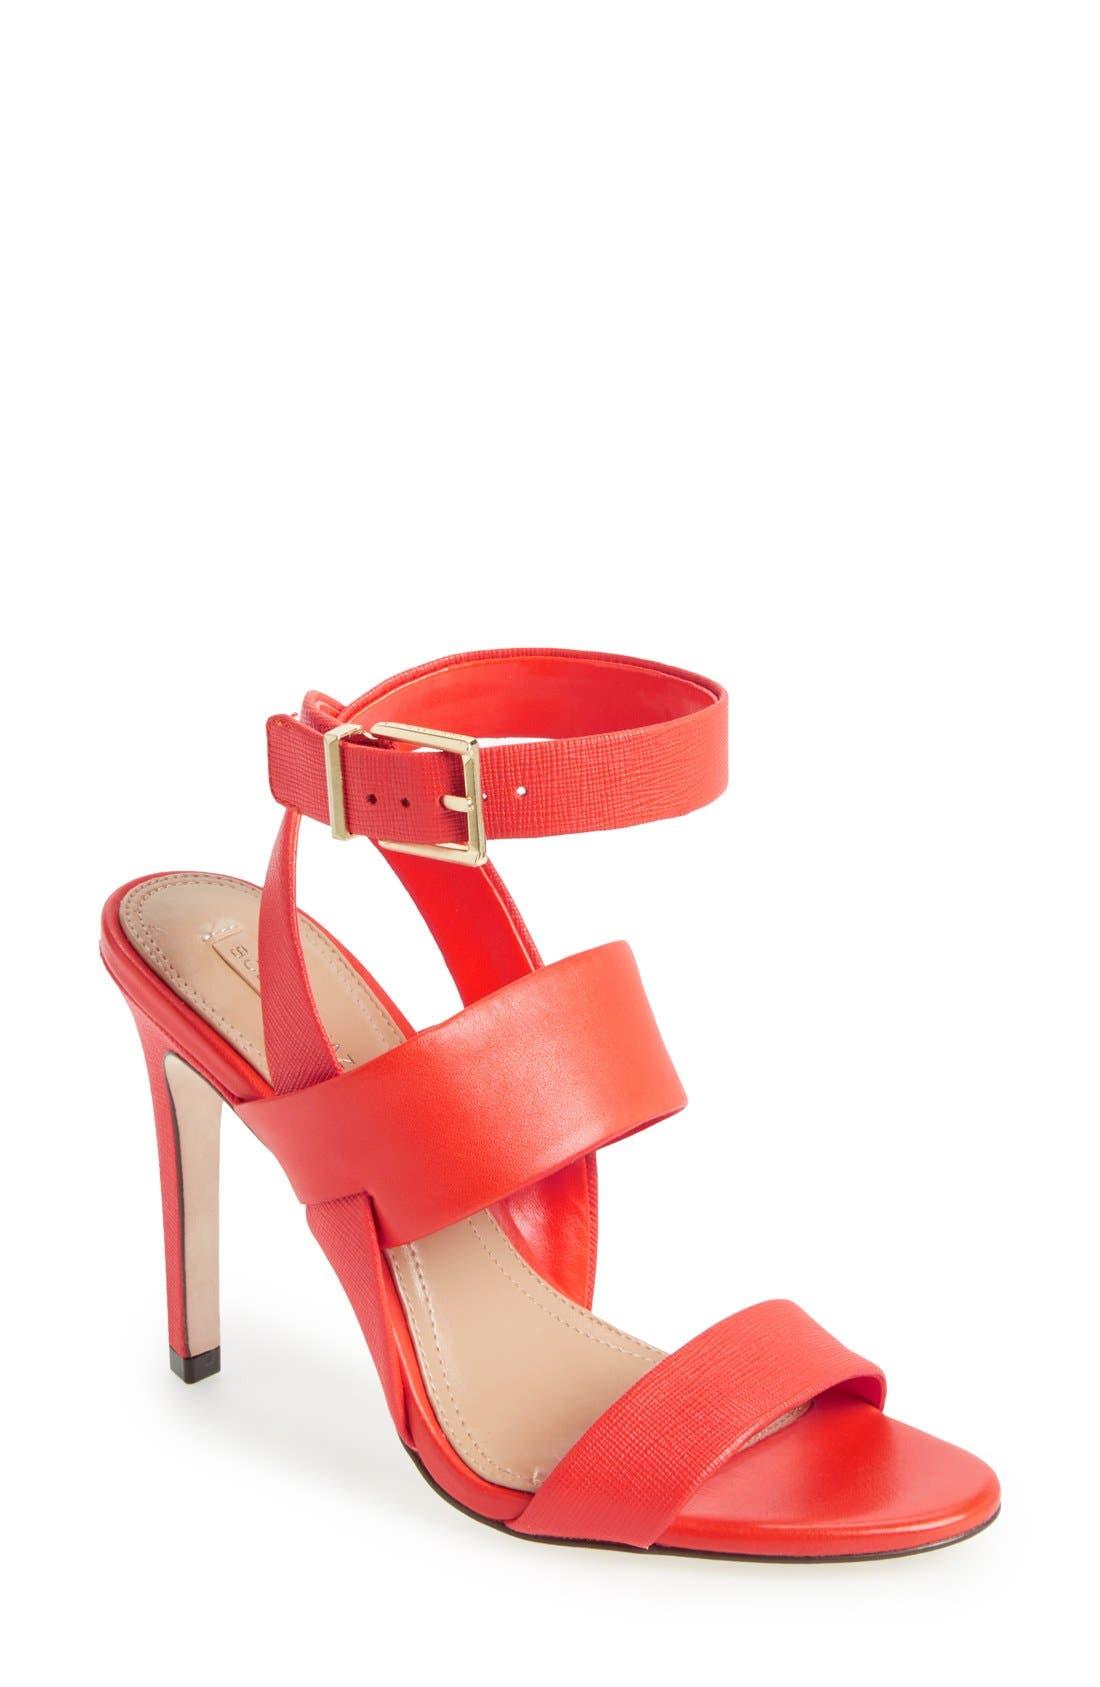 Main Image - BCBGMAXAXRIA 'Ricky' Ankle Strap Sandal (Women)